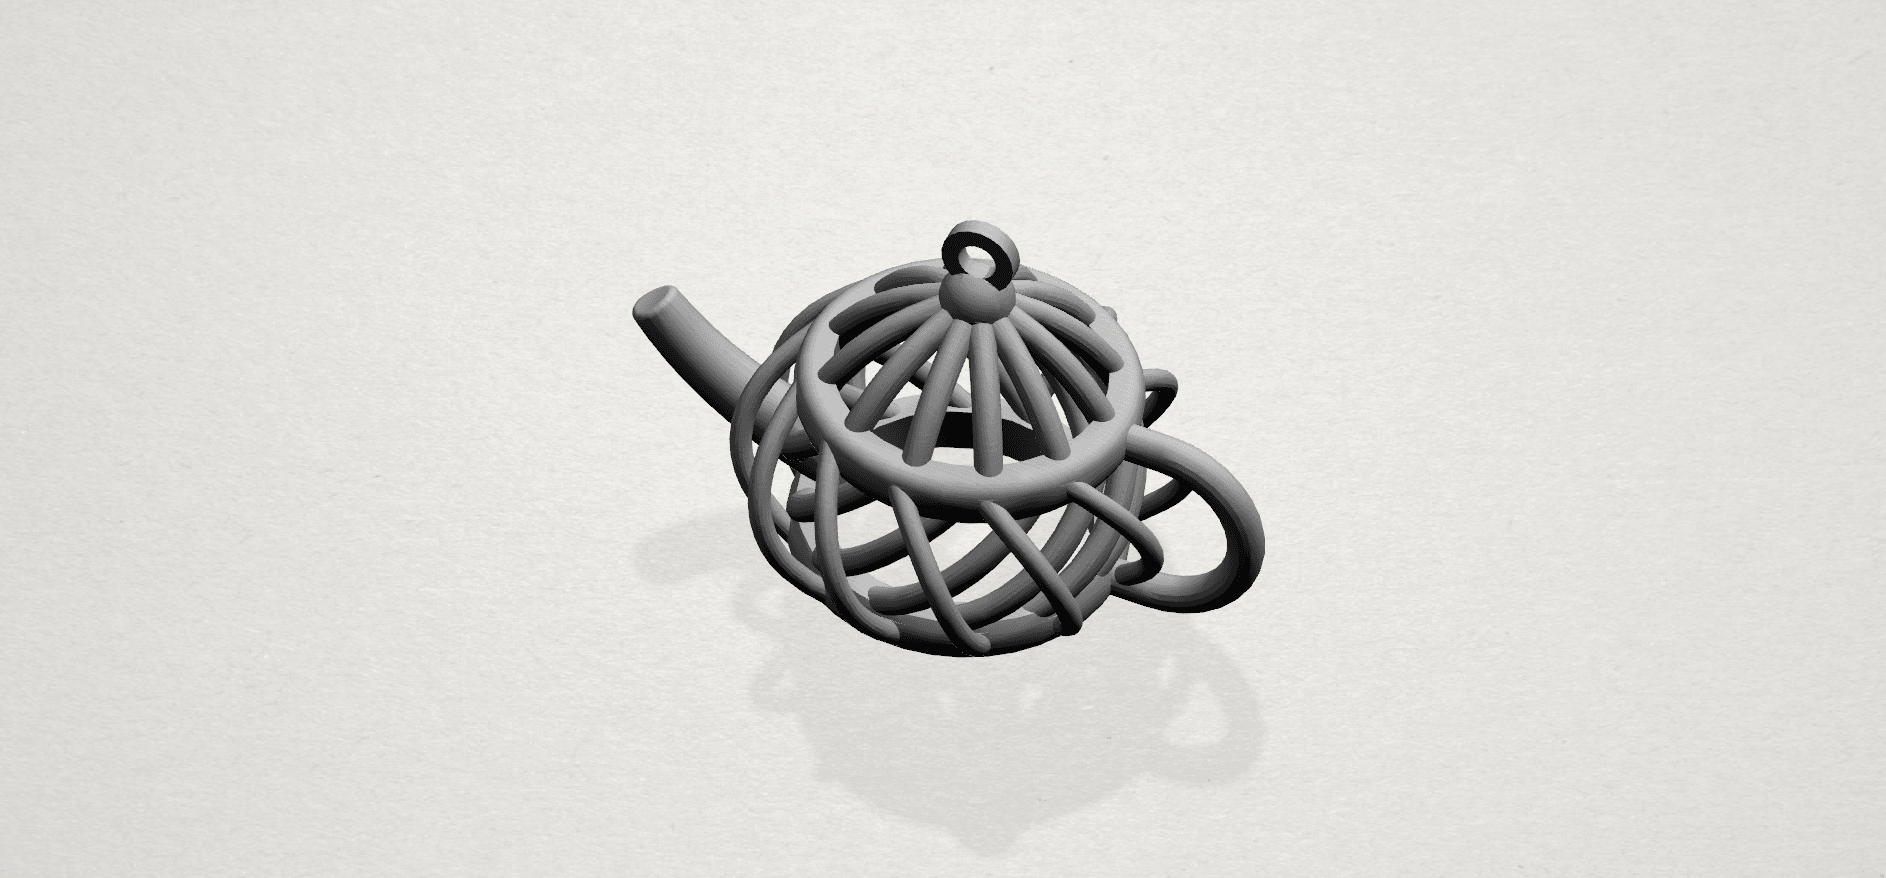 Necklace - Tea pot-A01.png Download free STL file Necklaces -Tea pot • 3D print object, GeorgesNikkei